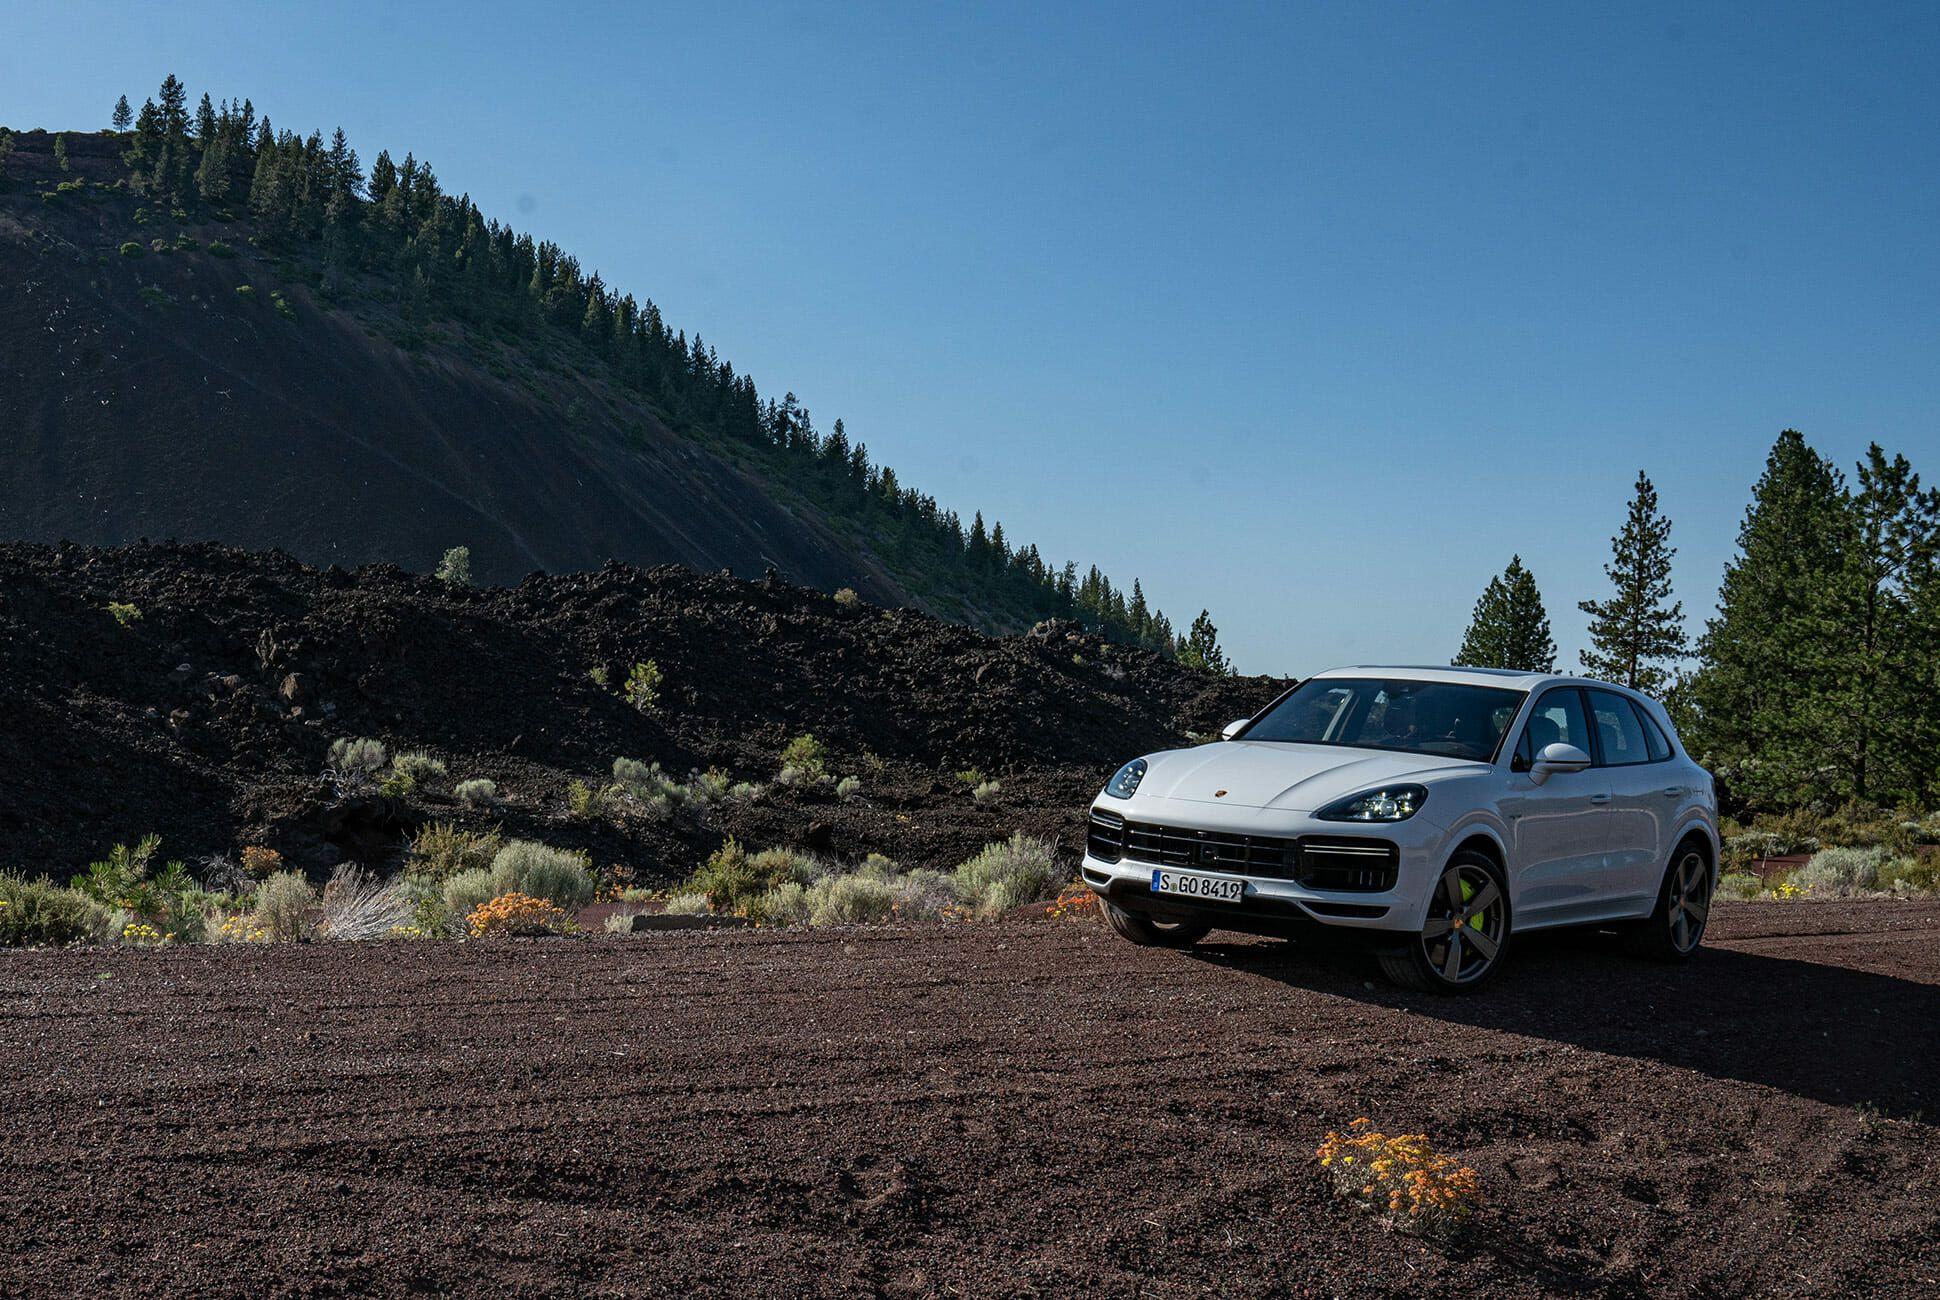 Pair-of-High-Tech-Porsche-Cayenne-Hybrids-gear-patrol-Lava-ambience-5